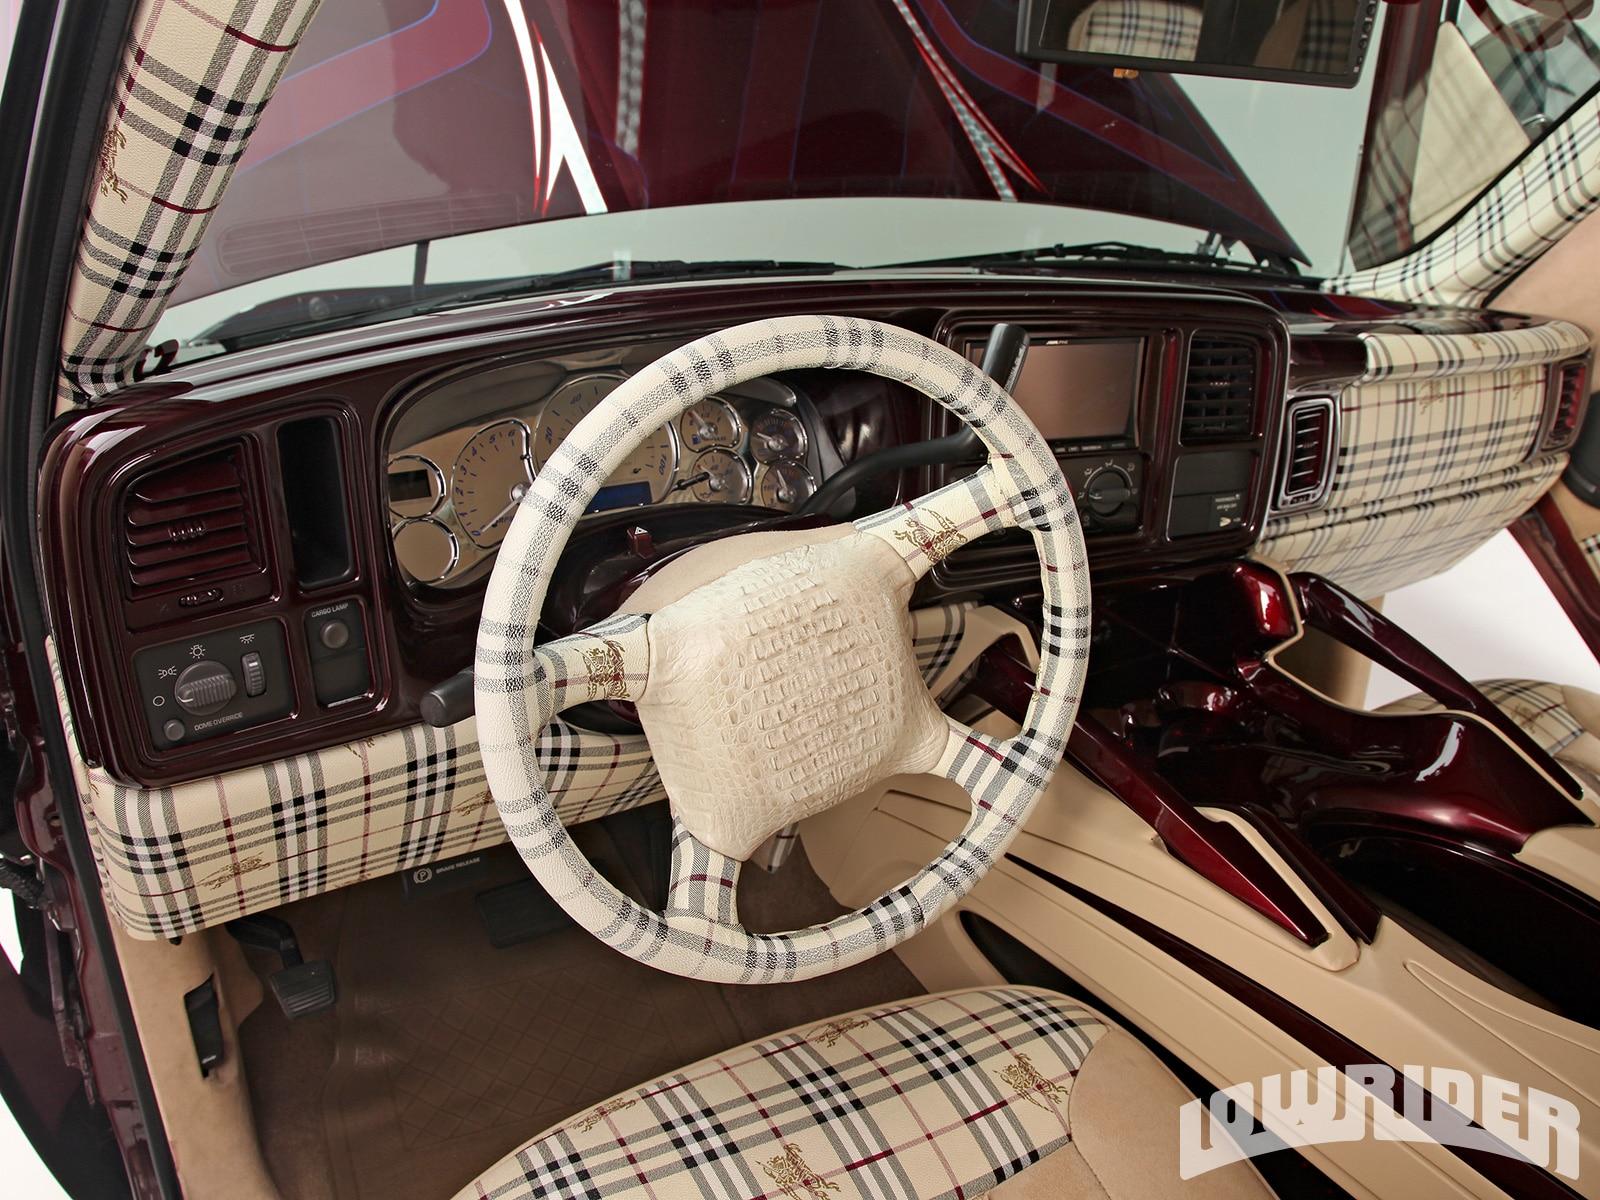 2000 Chevrolet Silverado - Lowrider Magazine